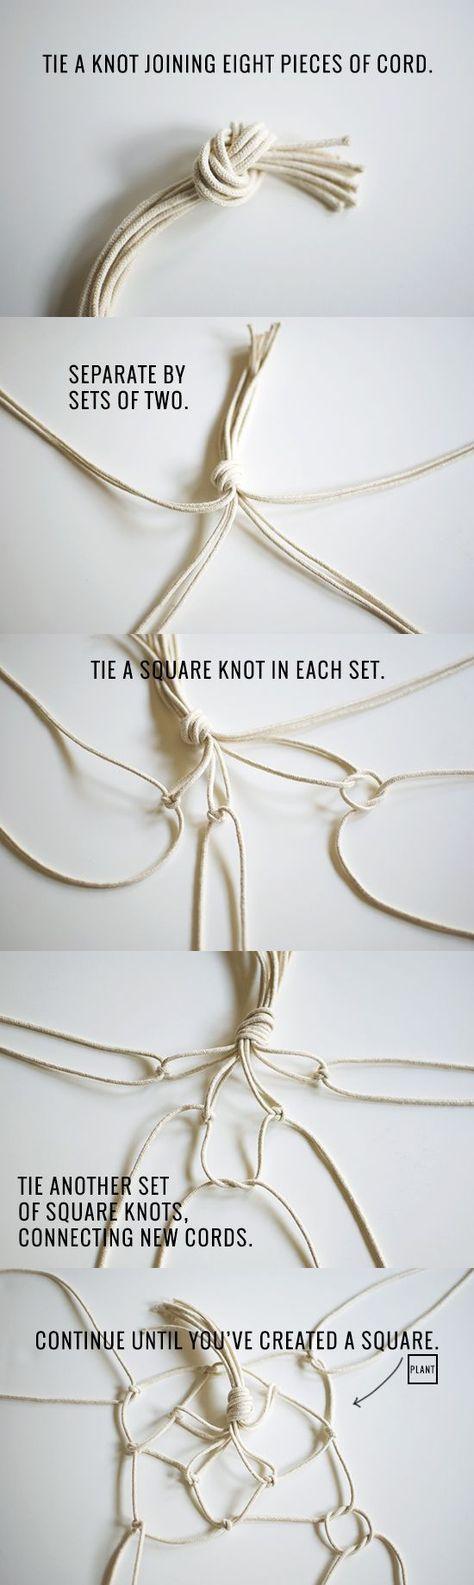 how to make a DIY macramé plant hanger | Inspired to Share #ankletsdiymacrame Priscilla Beiler